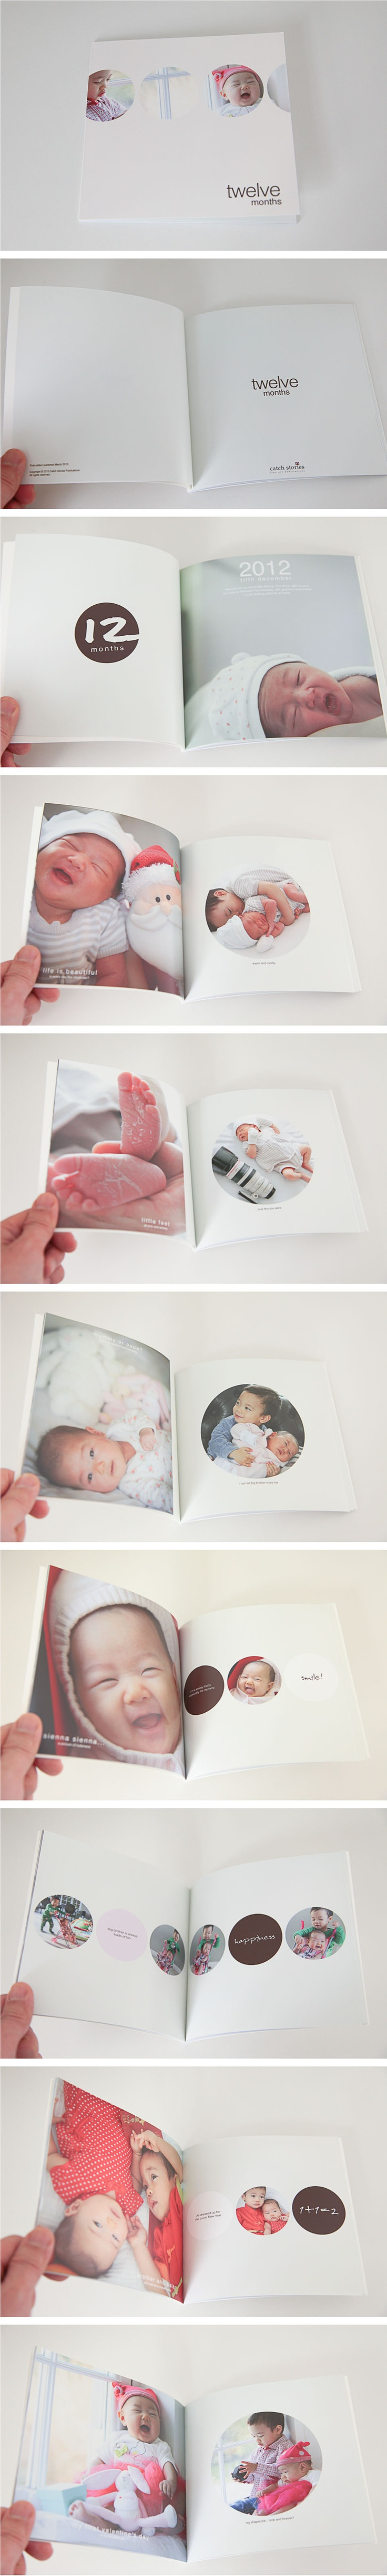 Fotobuchdesign - Babyfotos - #cf